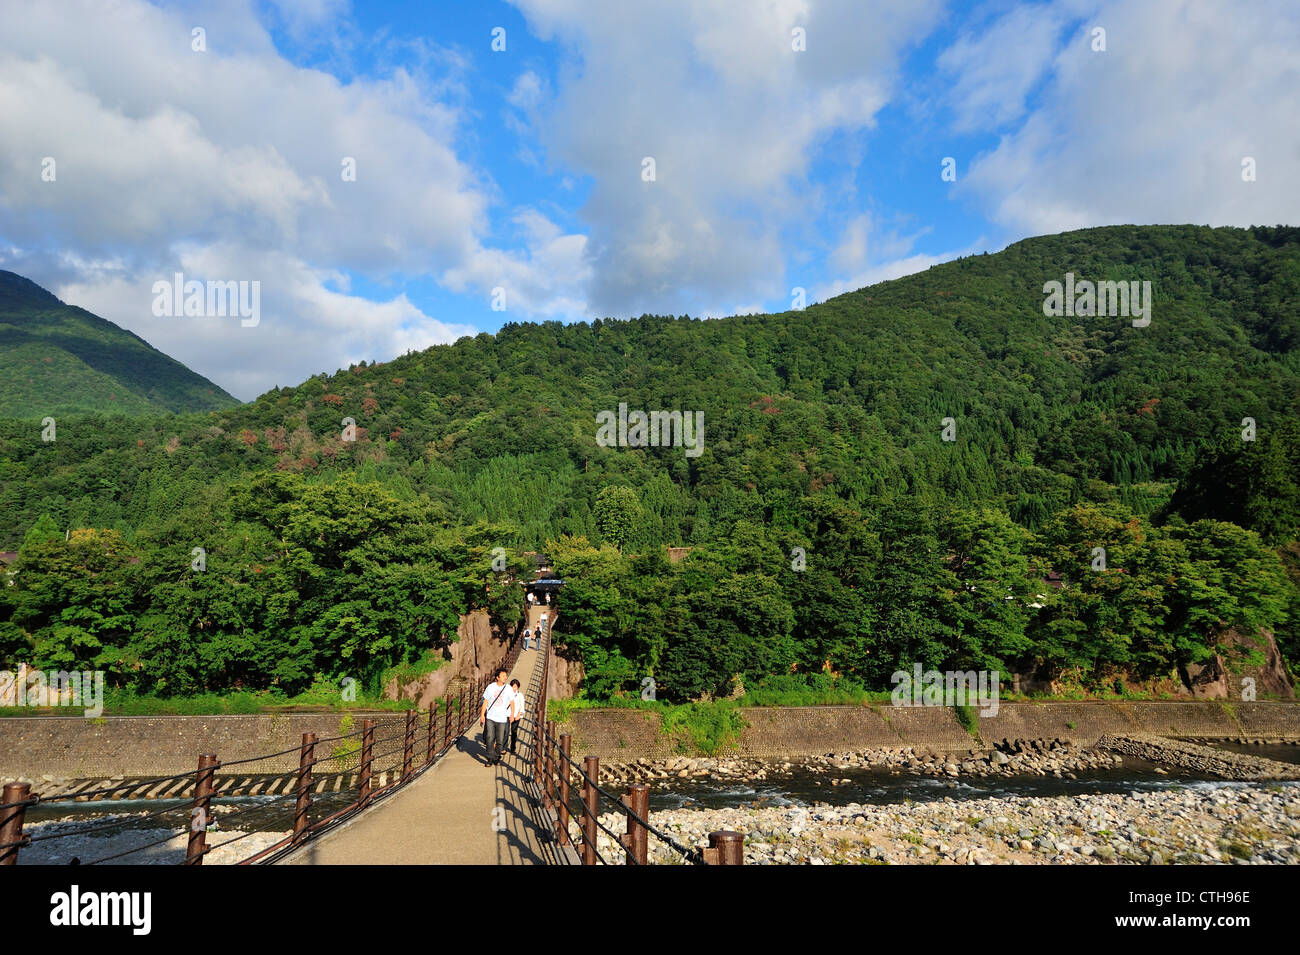 Deai-Bashi, Shirakawa-go, Gifu Prefecture, Japan Stock Photo